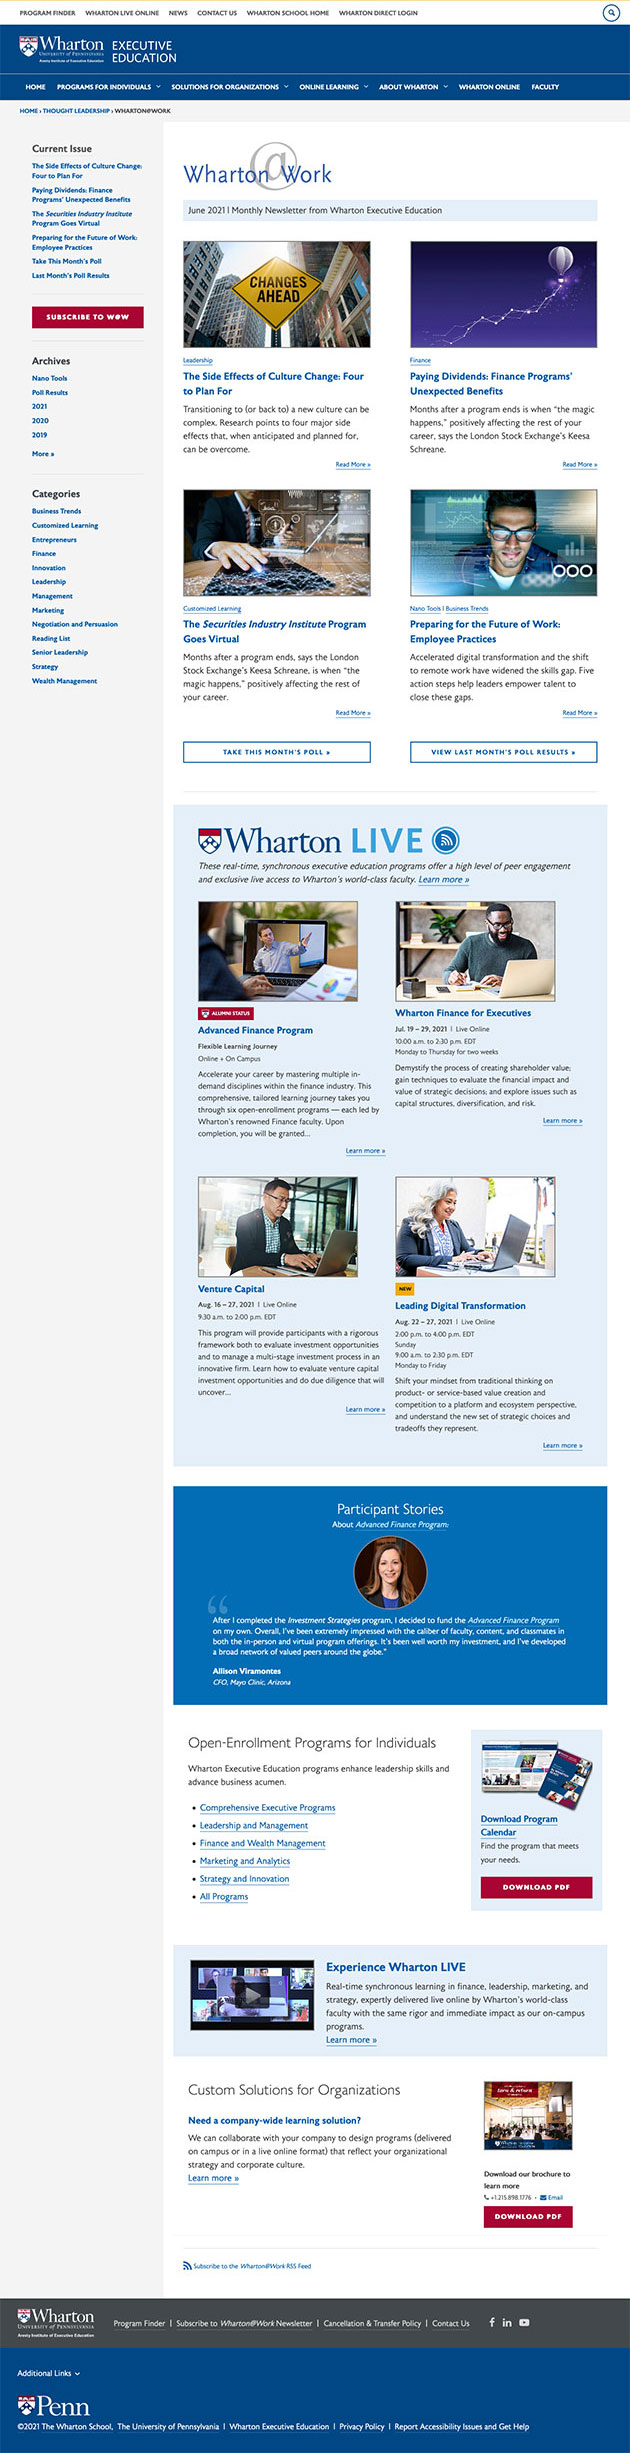 Wharton@Work Main Web Page